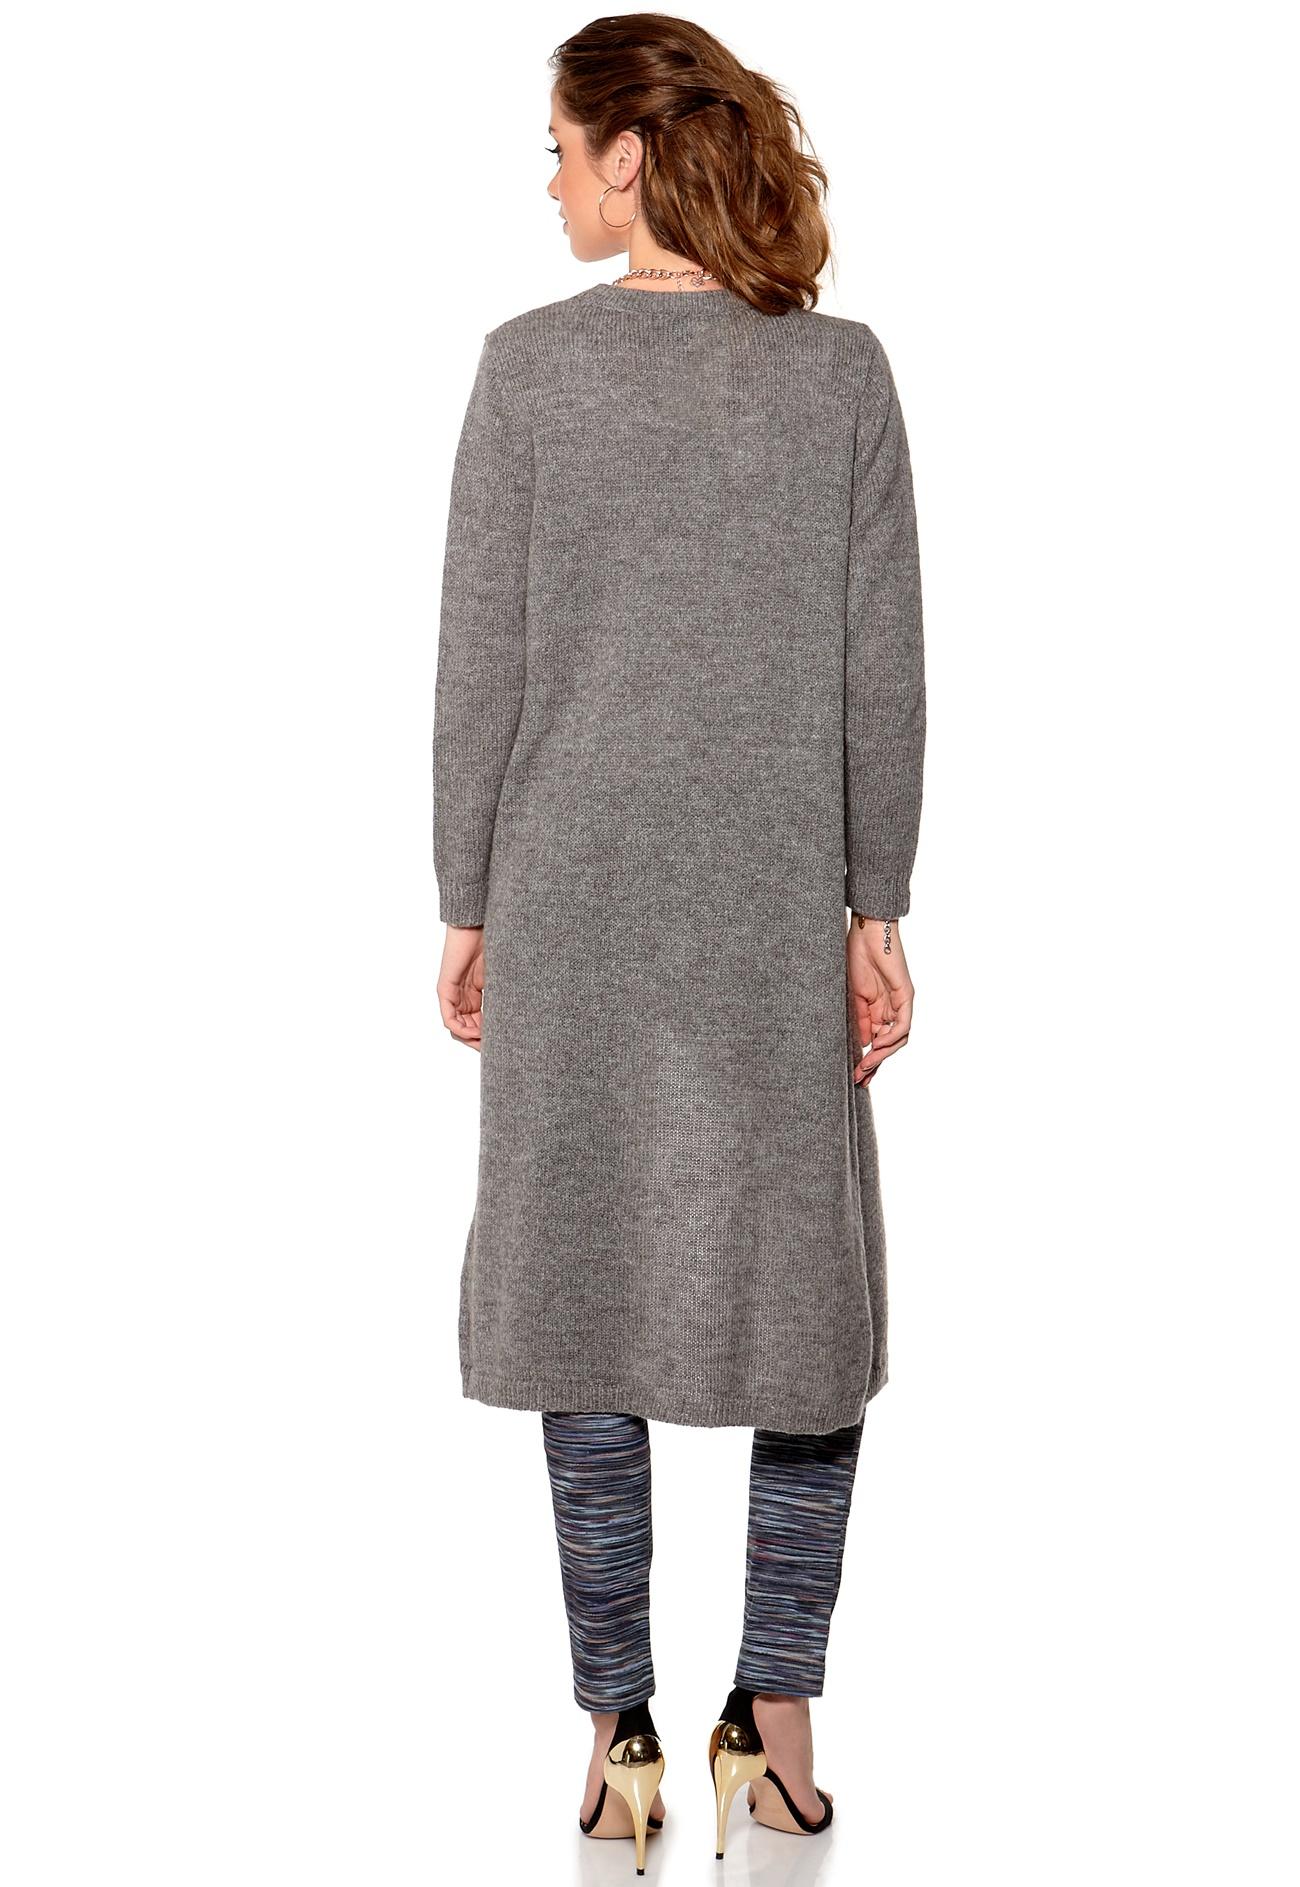 Y.A.S Super Long Knit Cardigan Light Grey Melange - Bubbleroom